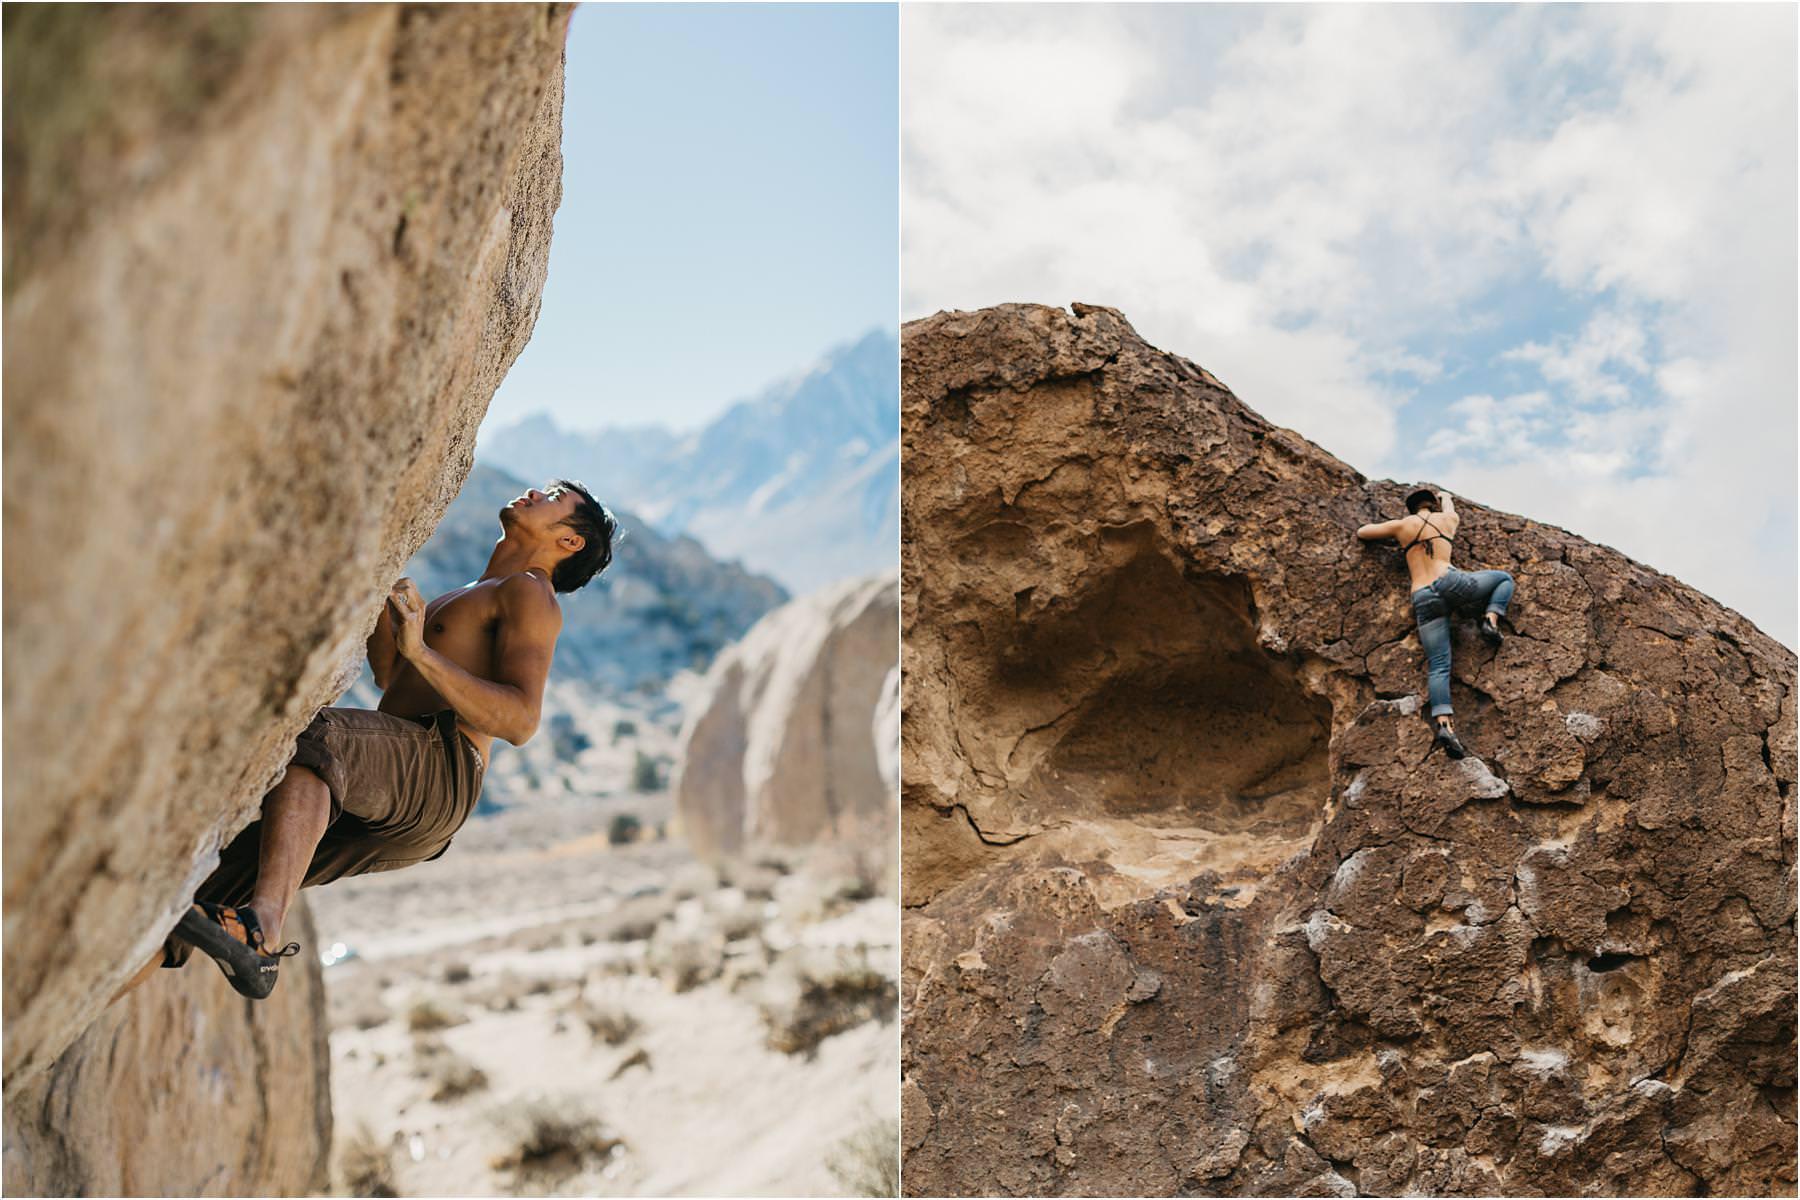 David and Justina Tam climbing boulders in Bishop, California